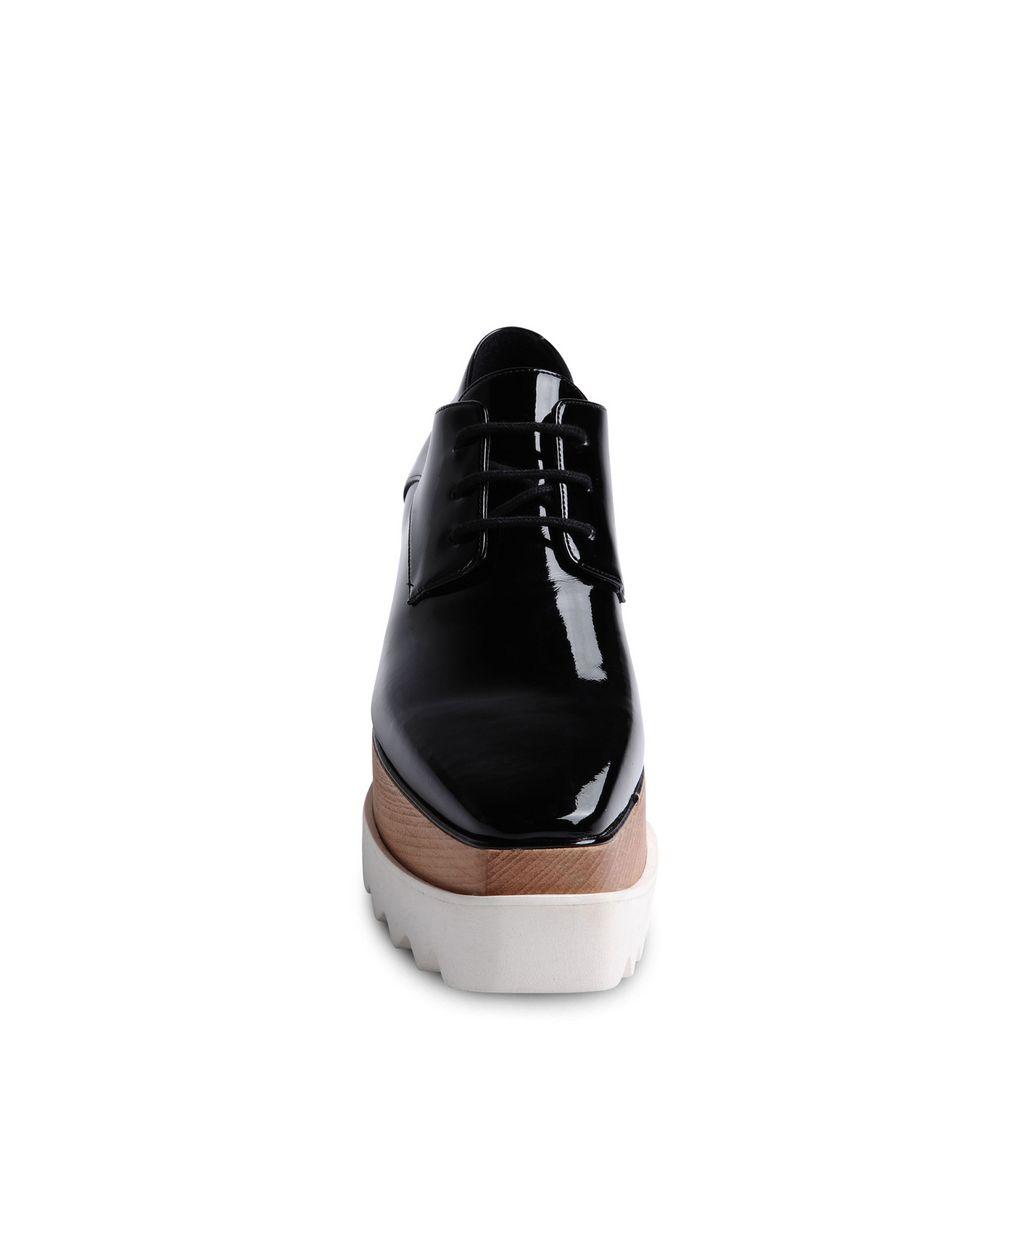 Black Patent Elyse Shoes - STELLA MCCARTNEY